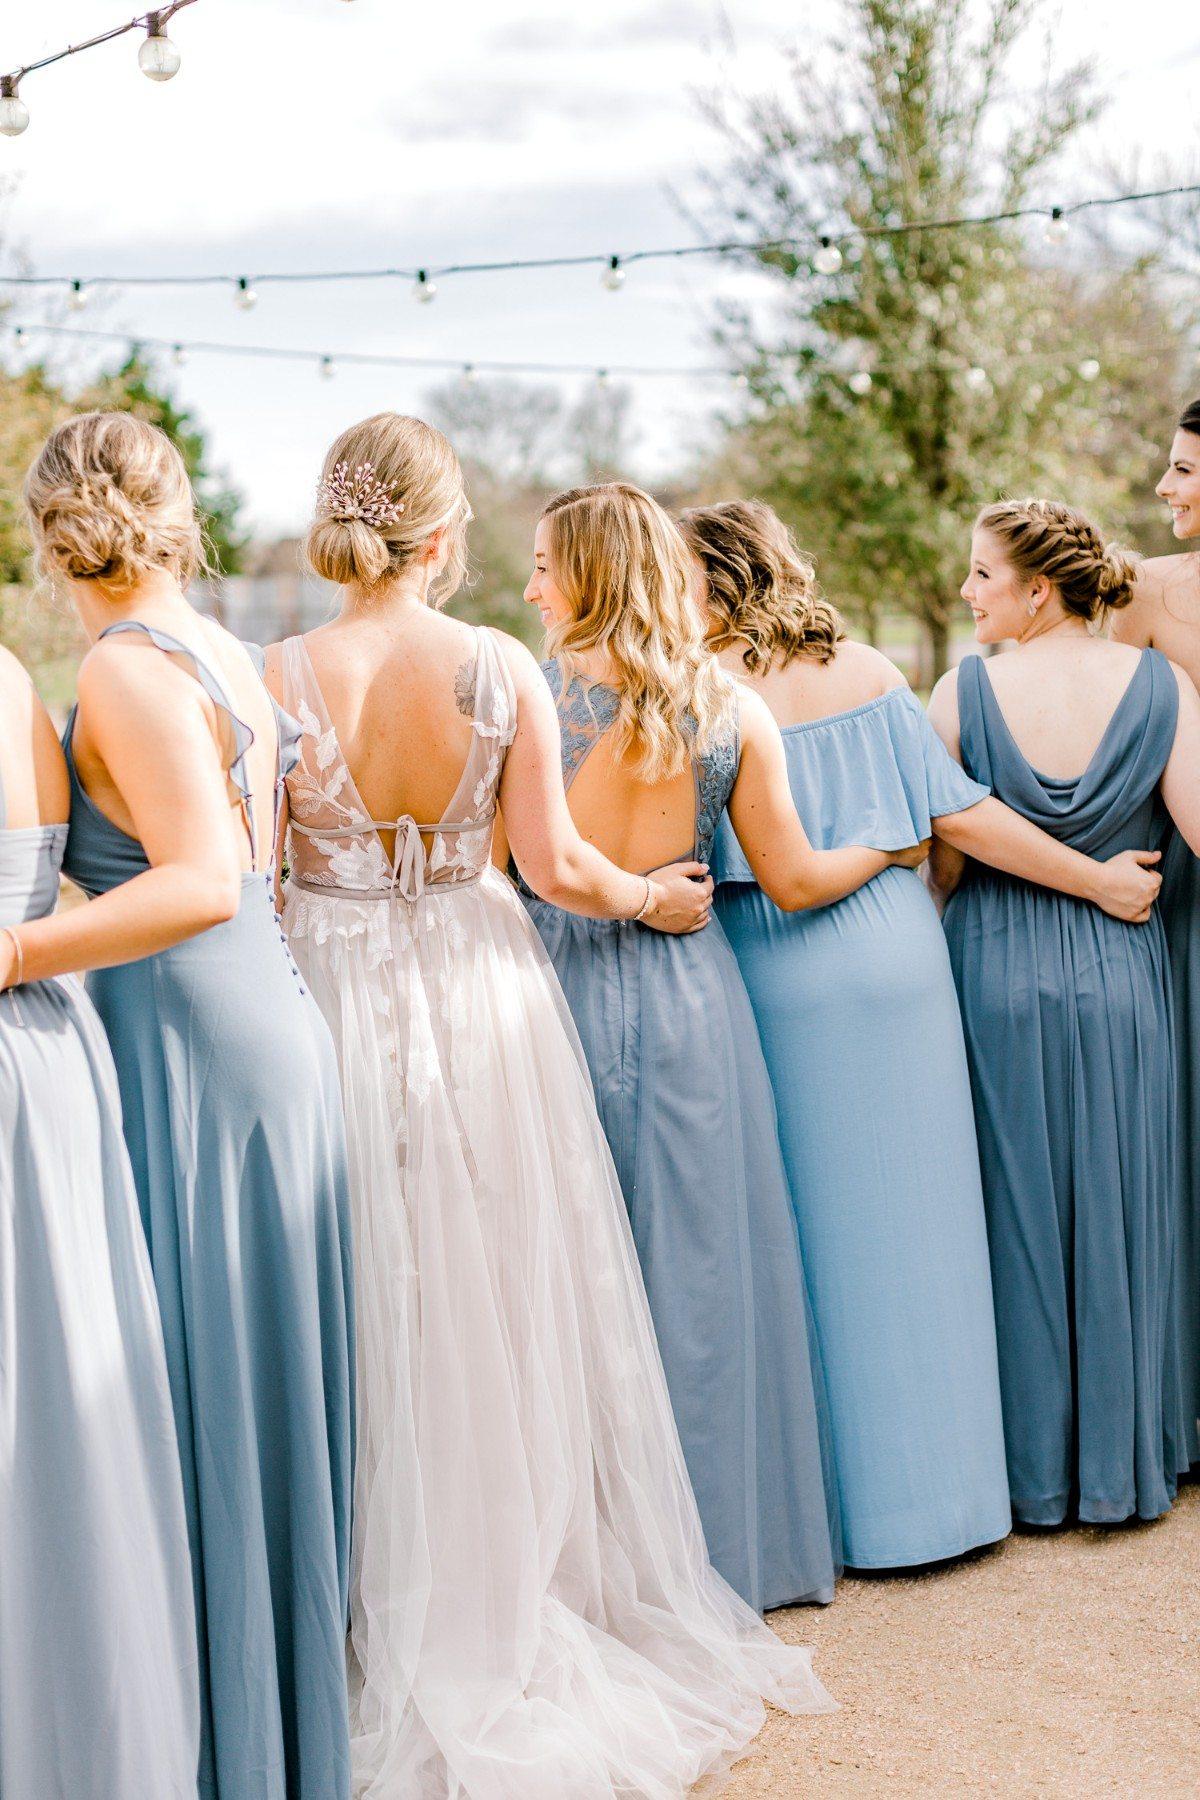 ennis-texas-wedding-photographer-kaitlyn-bullard-33.jpg